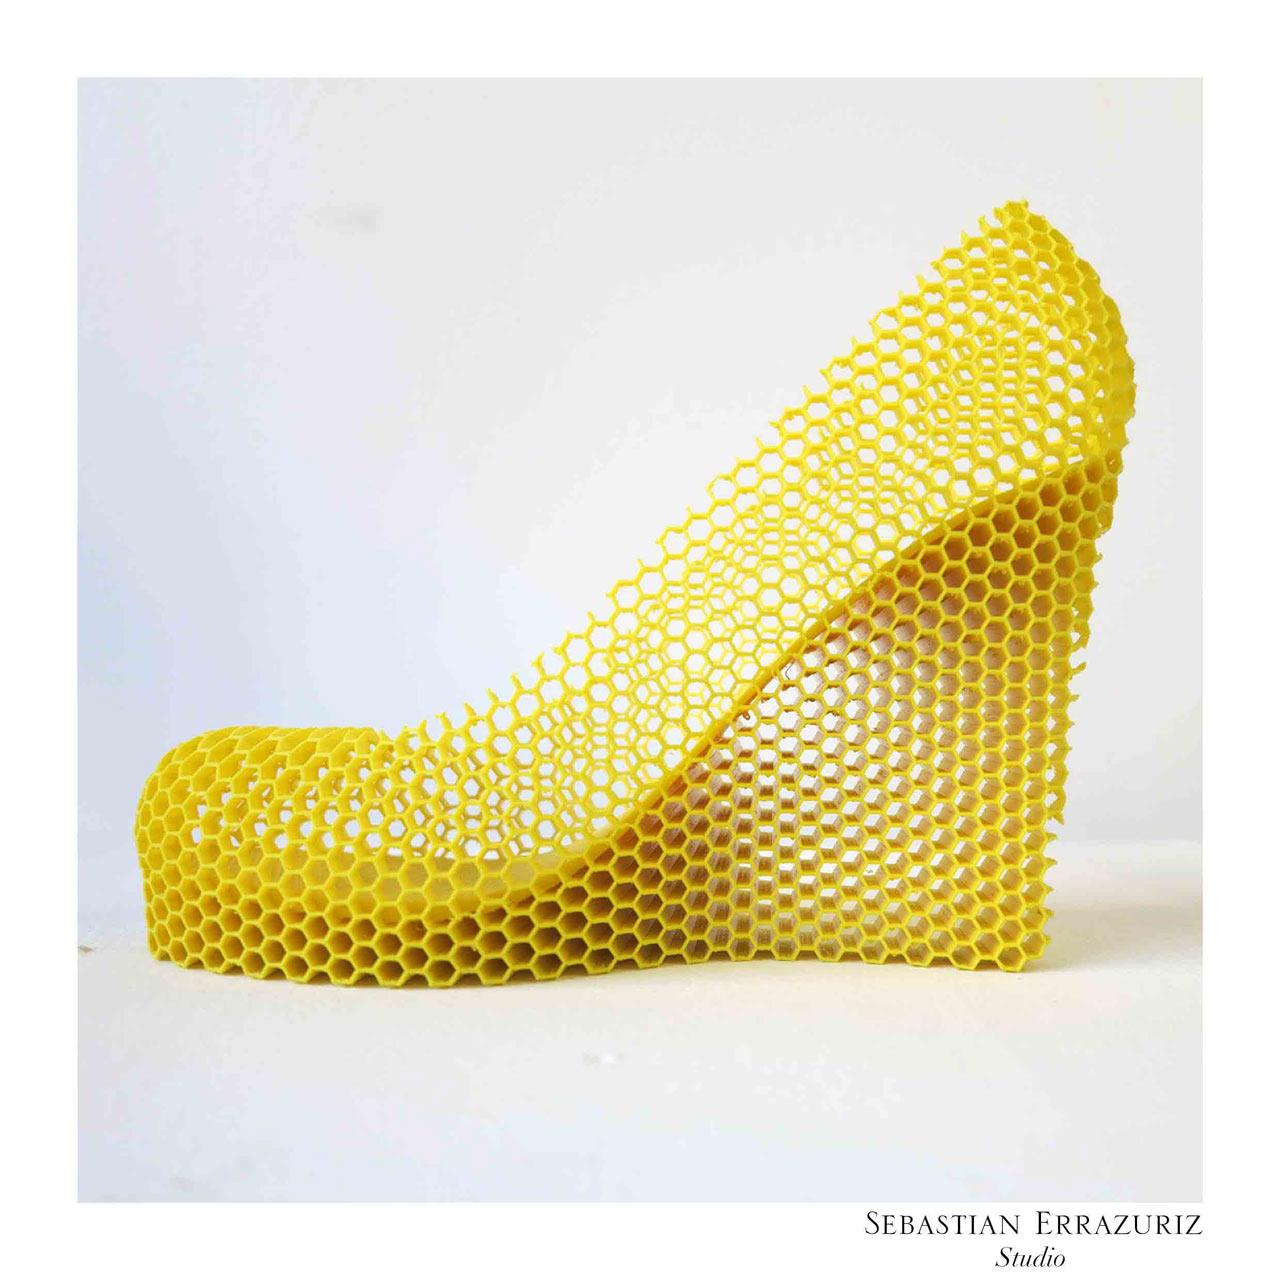 12 Shoes for 12 Lovers by Sebastian Errazuriz: Part 1